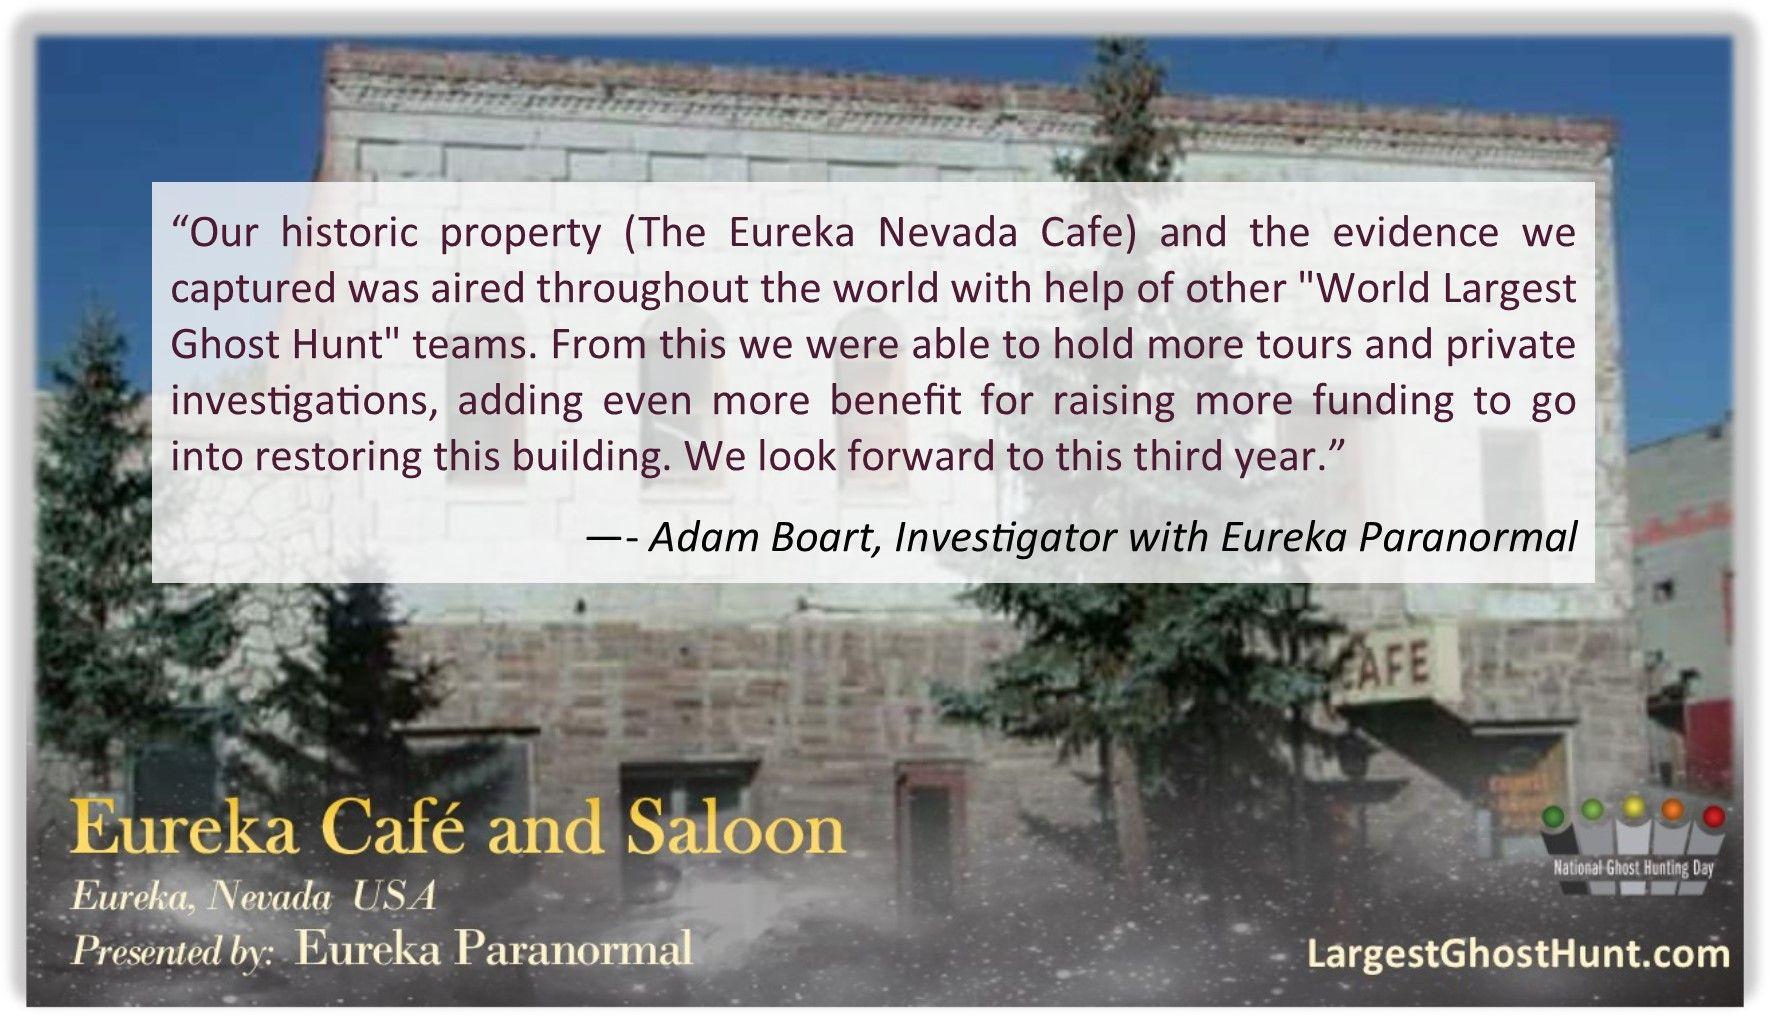 Eureka Cafe and Saloon